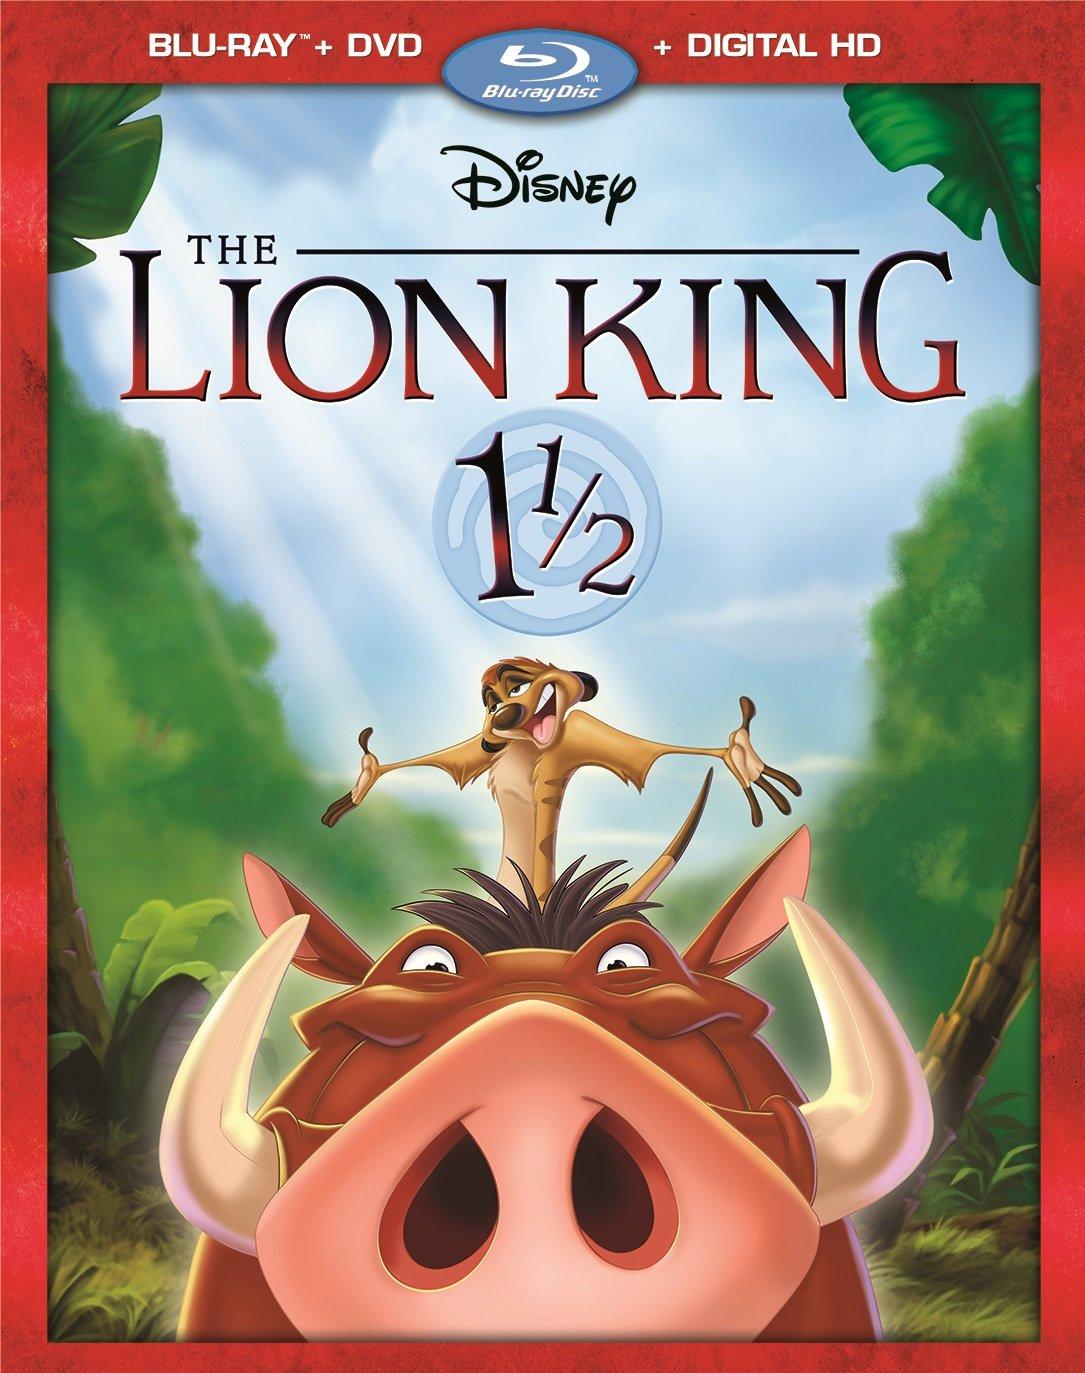 The Lion King 1 1/2 [Blu-ray] by Walt Disney Video